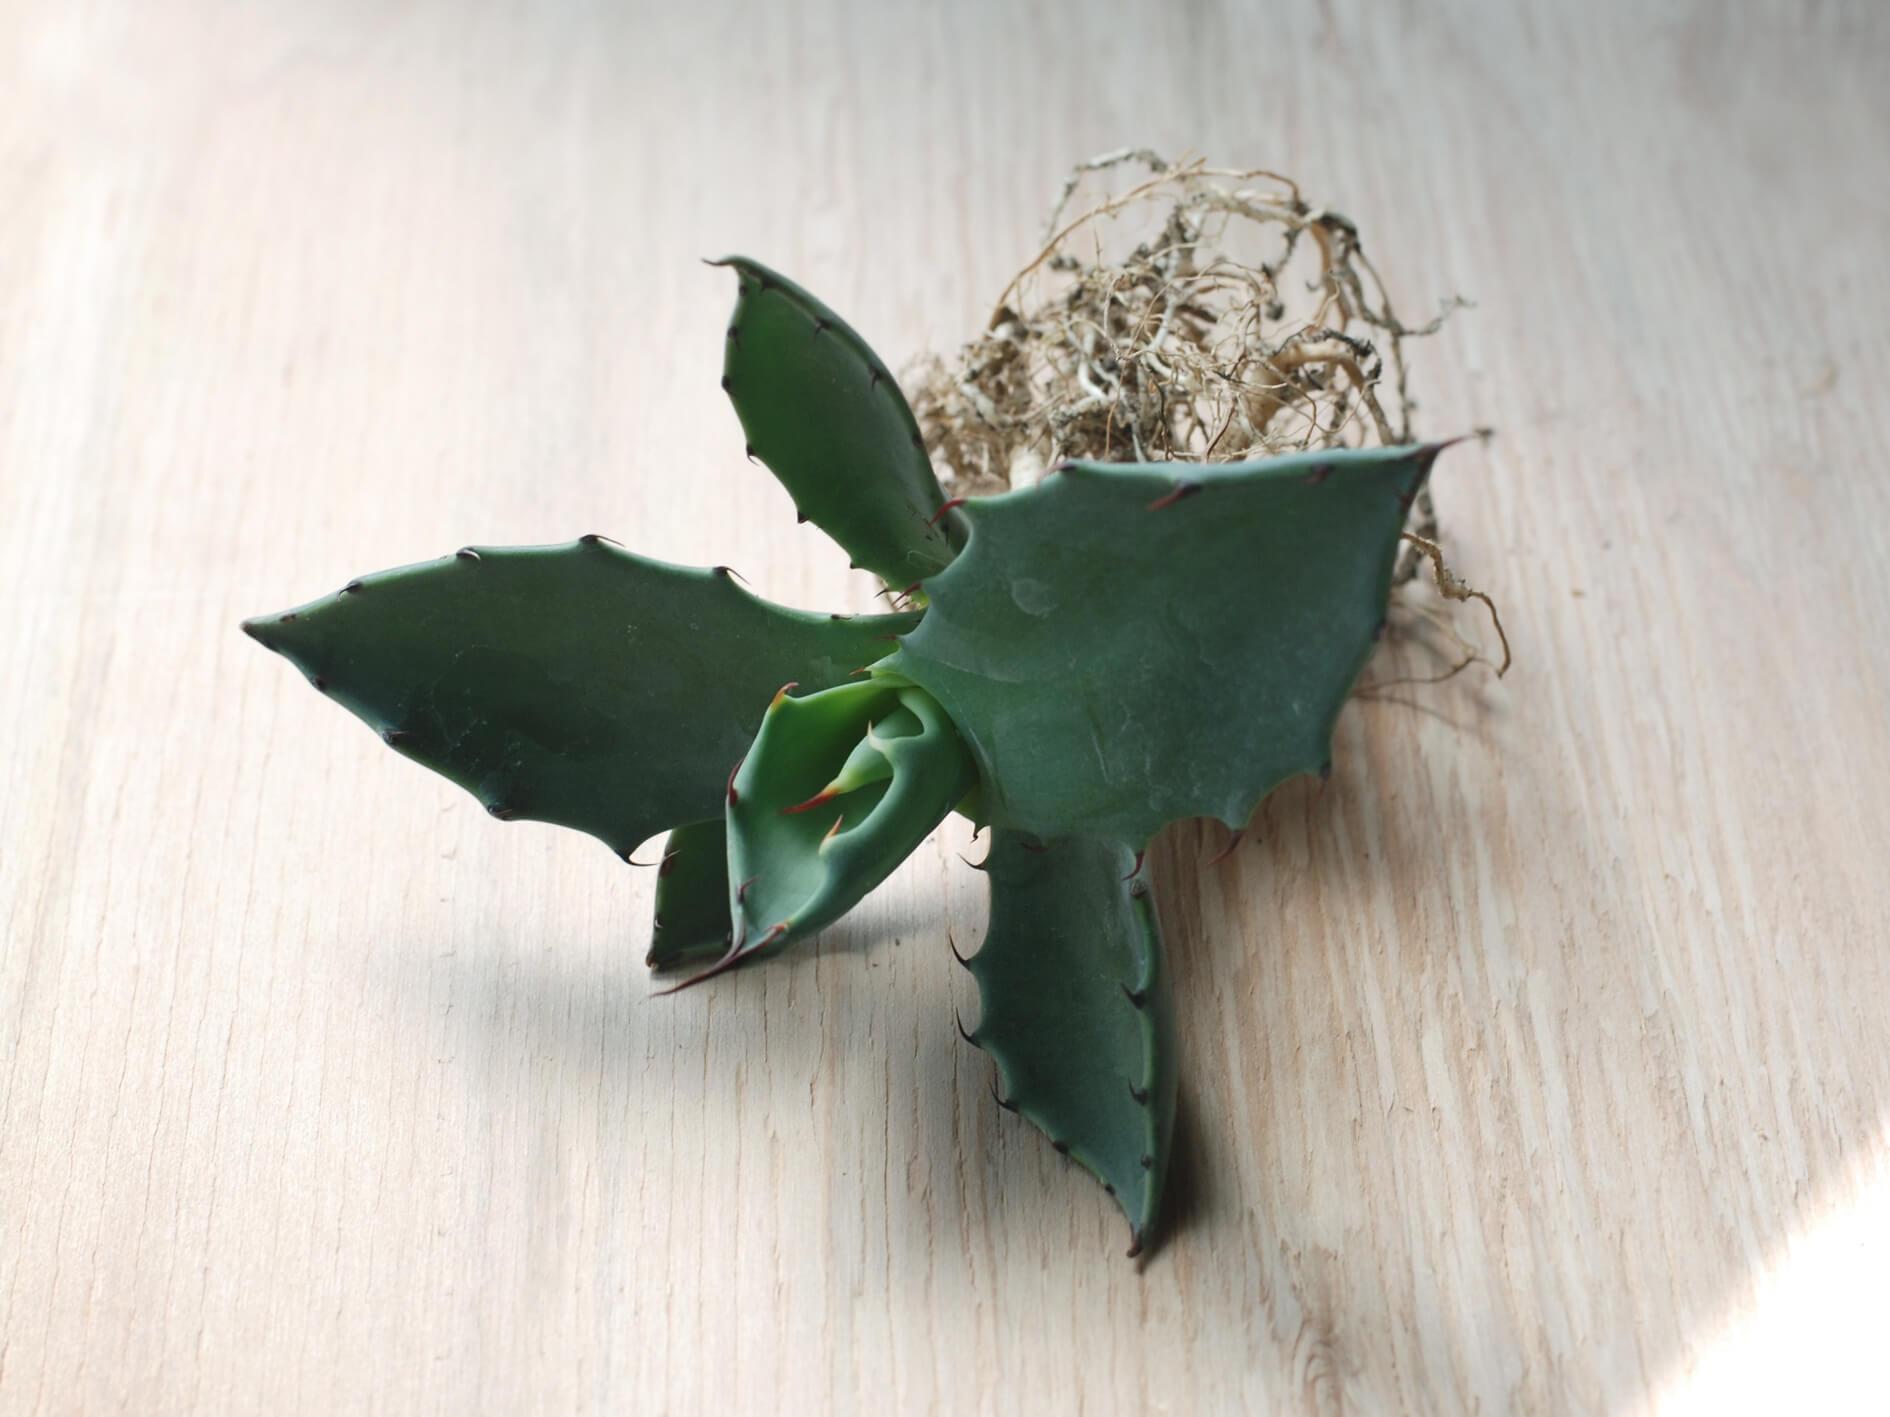 agave-shrevei-magna-roots-apr-2020.jpg